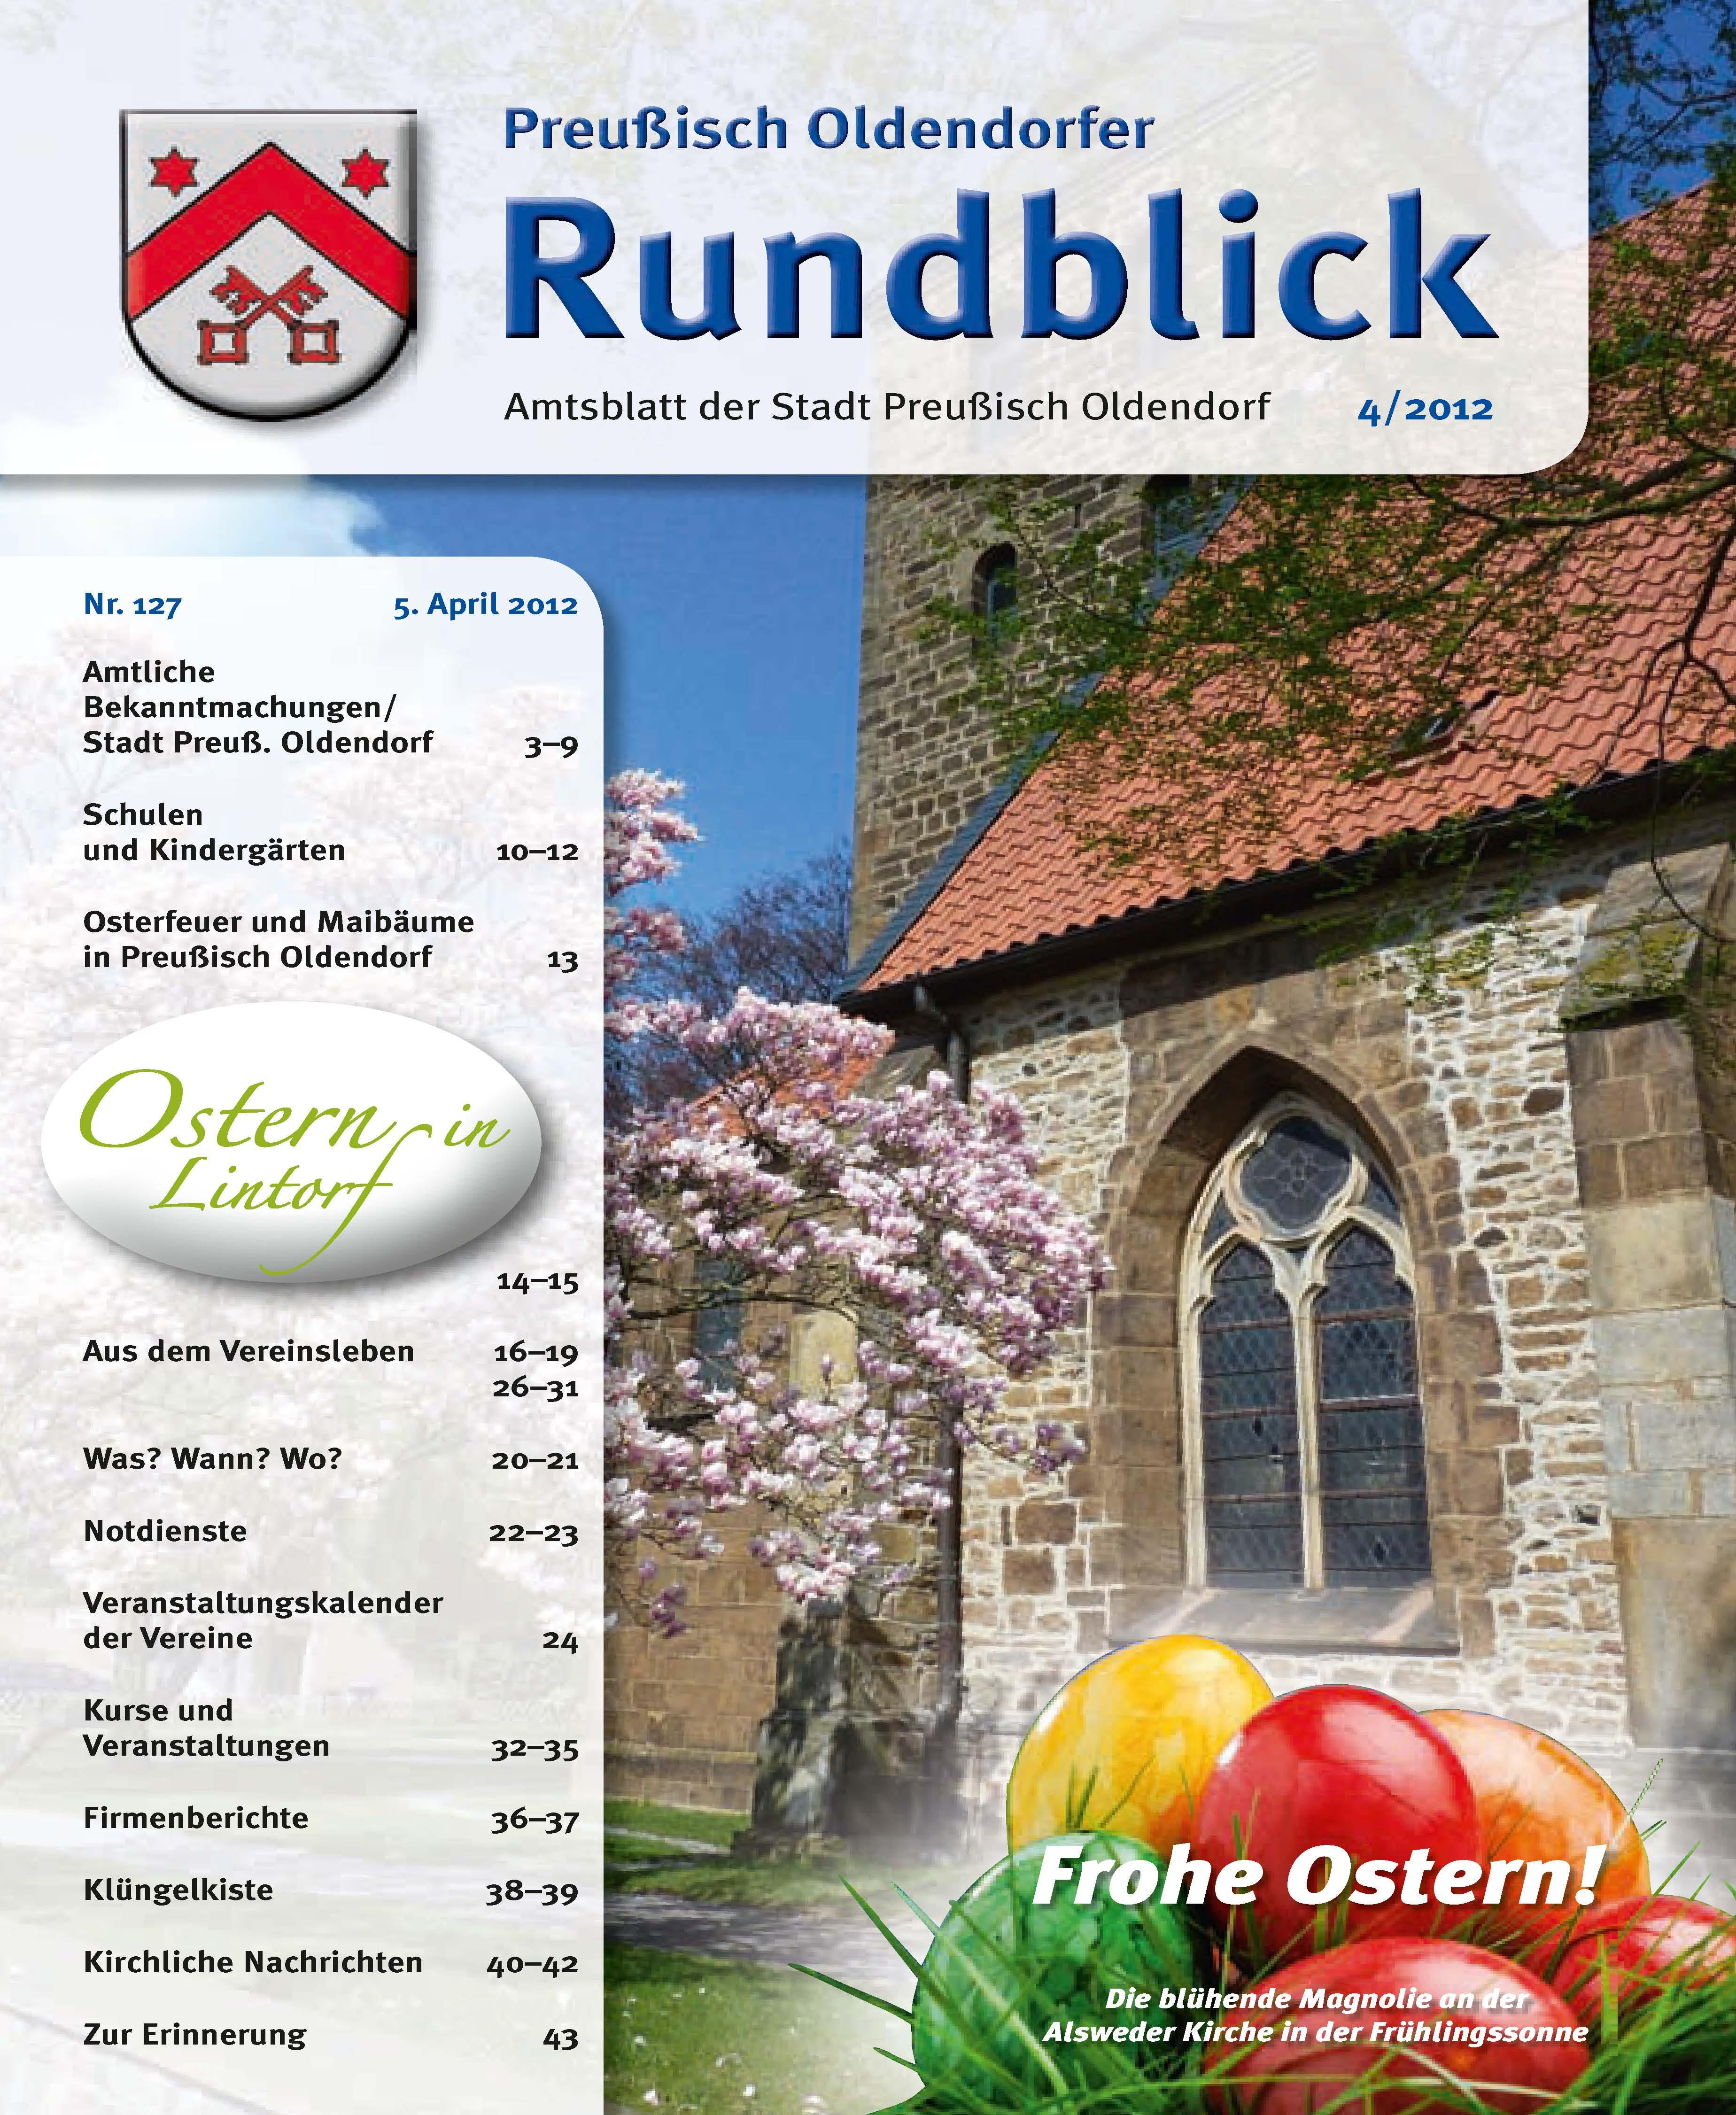 Rundblick 4-2012 Titel